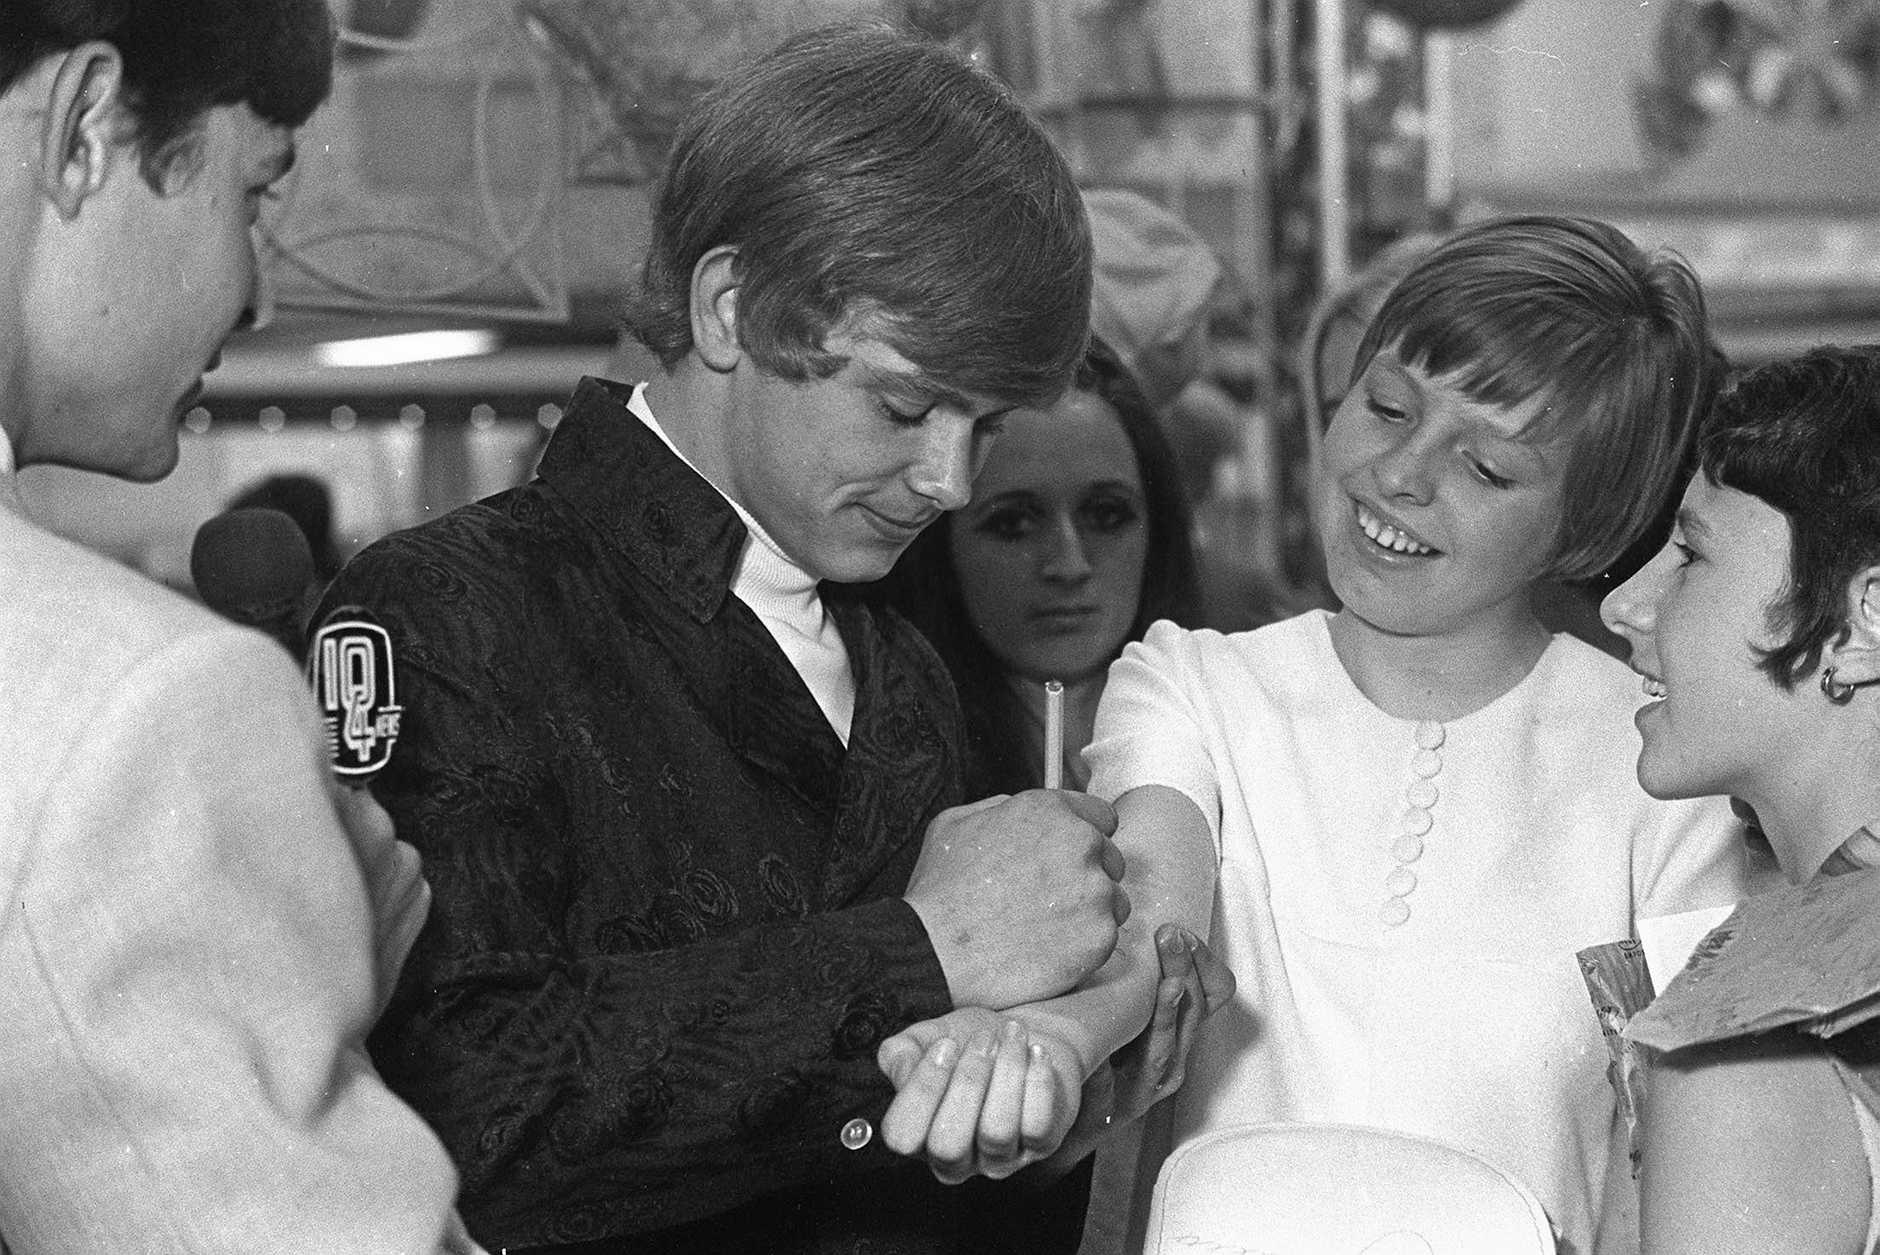 John Farnham in Toowoomba for The Carnival of Flowers in 1968